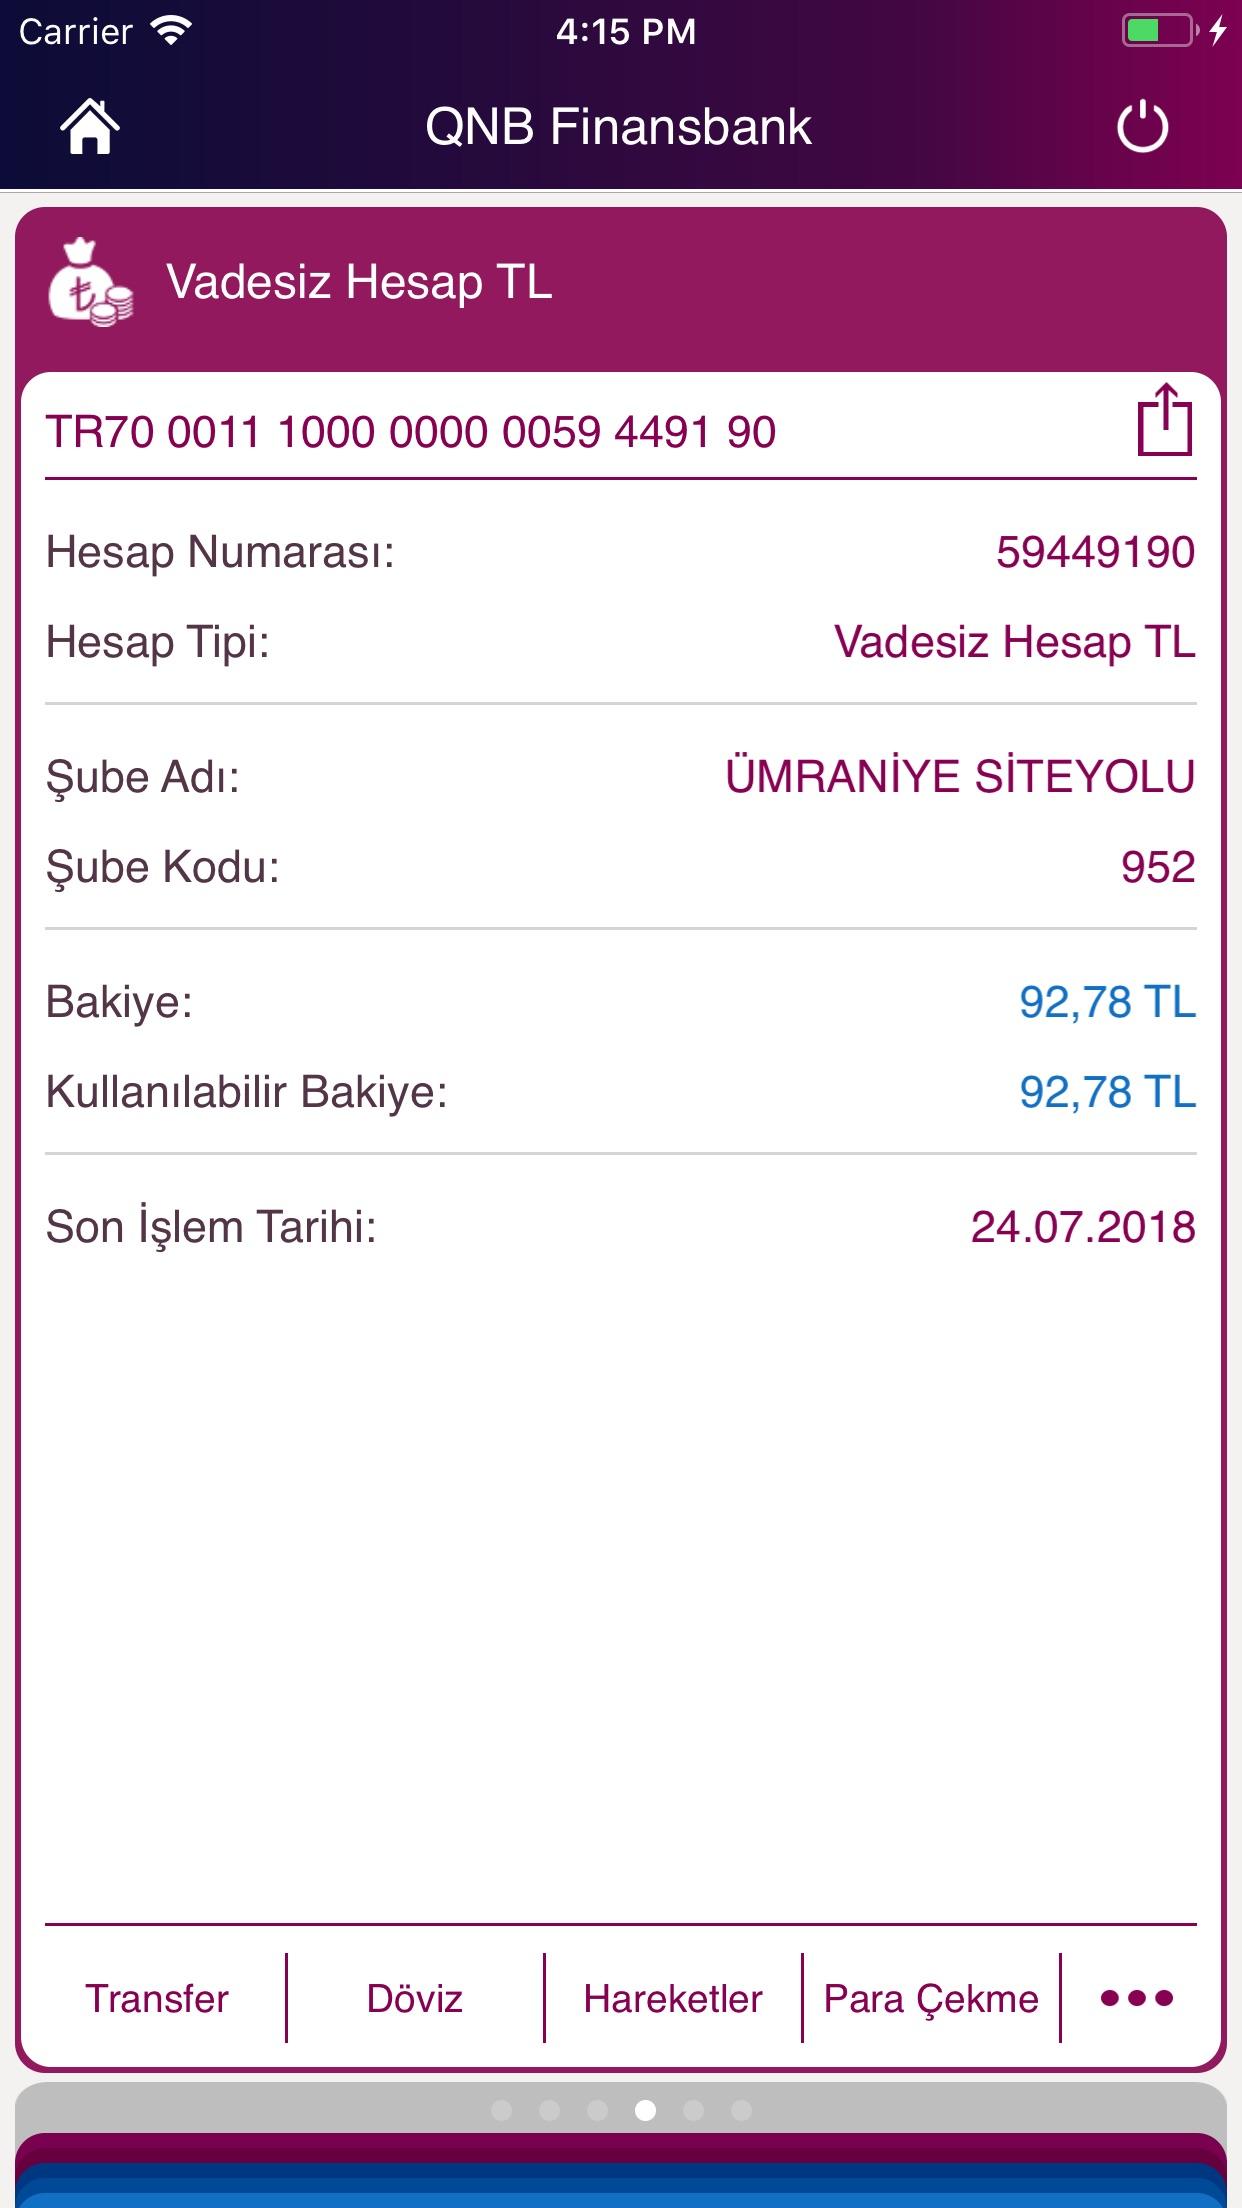 QNB Finansbank Cep Şubesi Screenshot